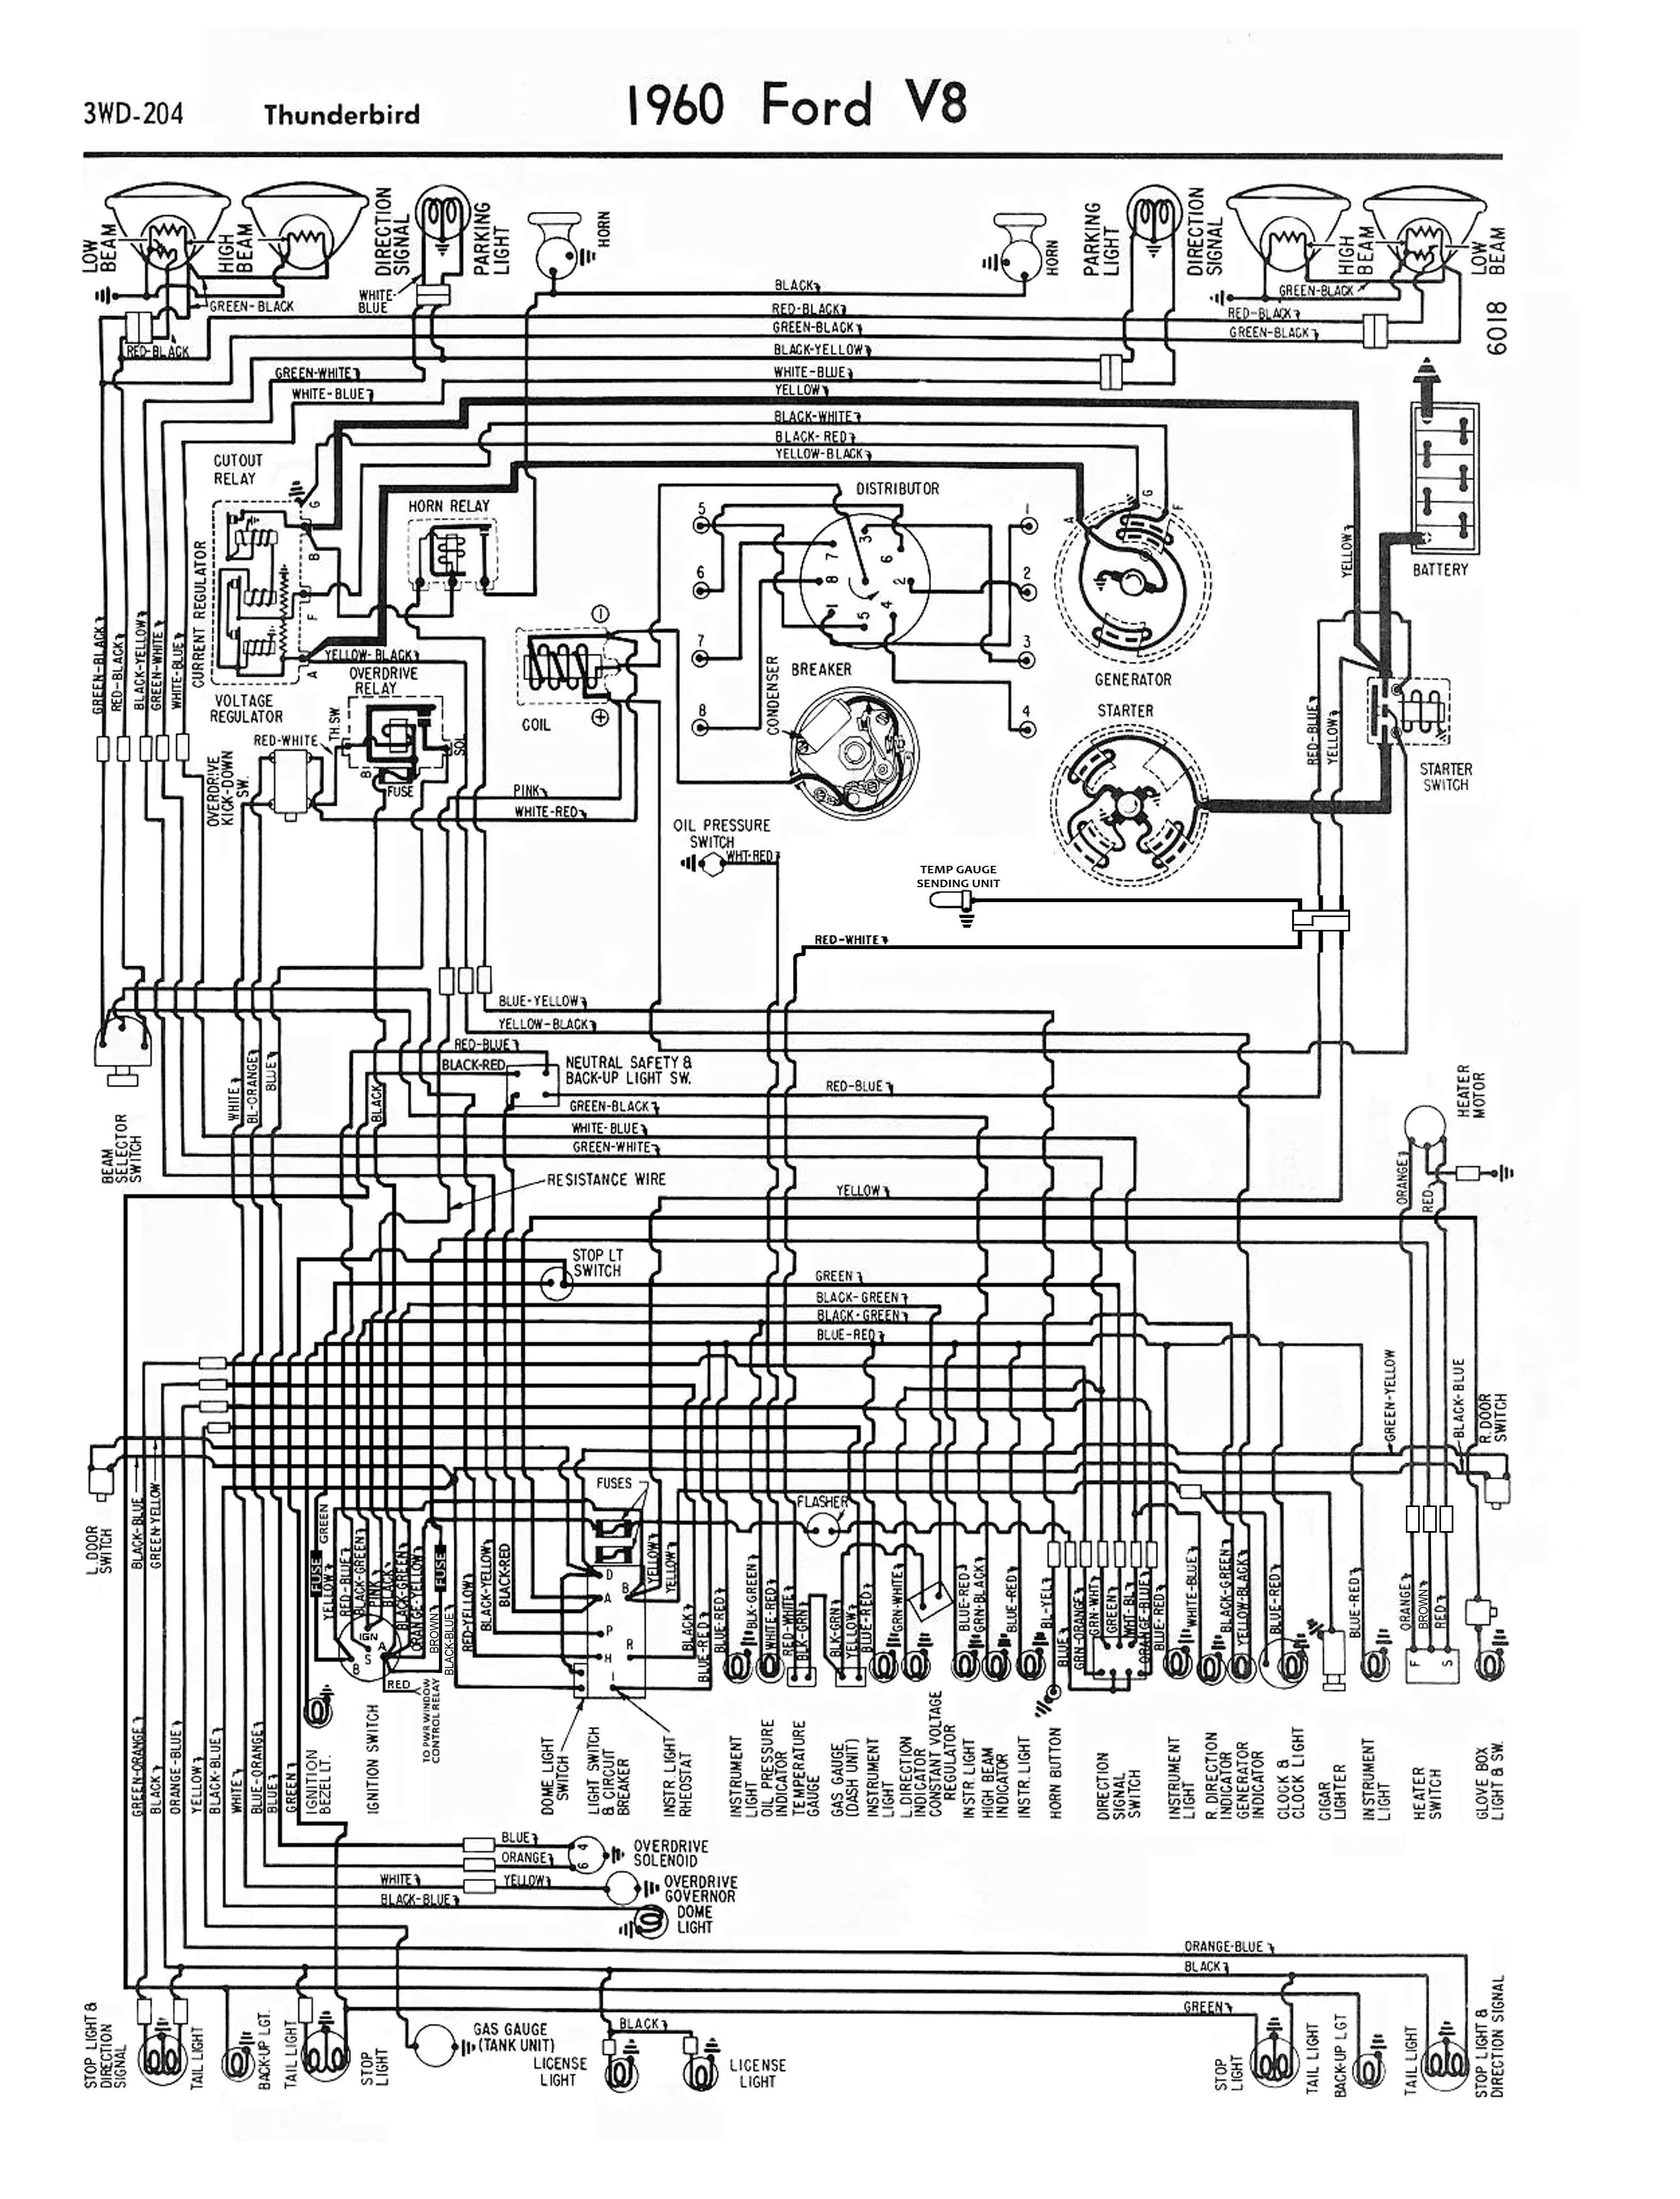 Groovy 1968 Ford Convertible Wiring Diagram Wiring Diagram Tutorial Wiring Cloud Hisonepsysticxongrecoveryedborg